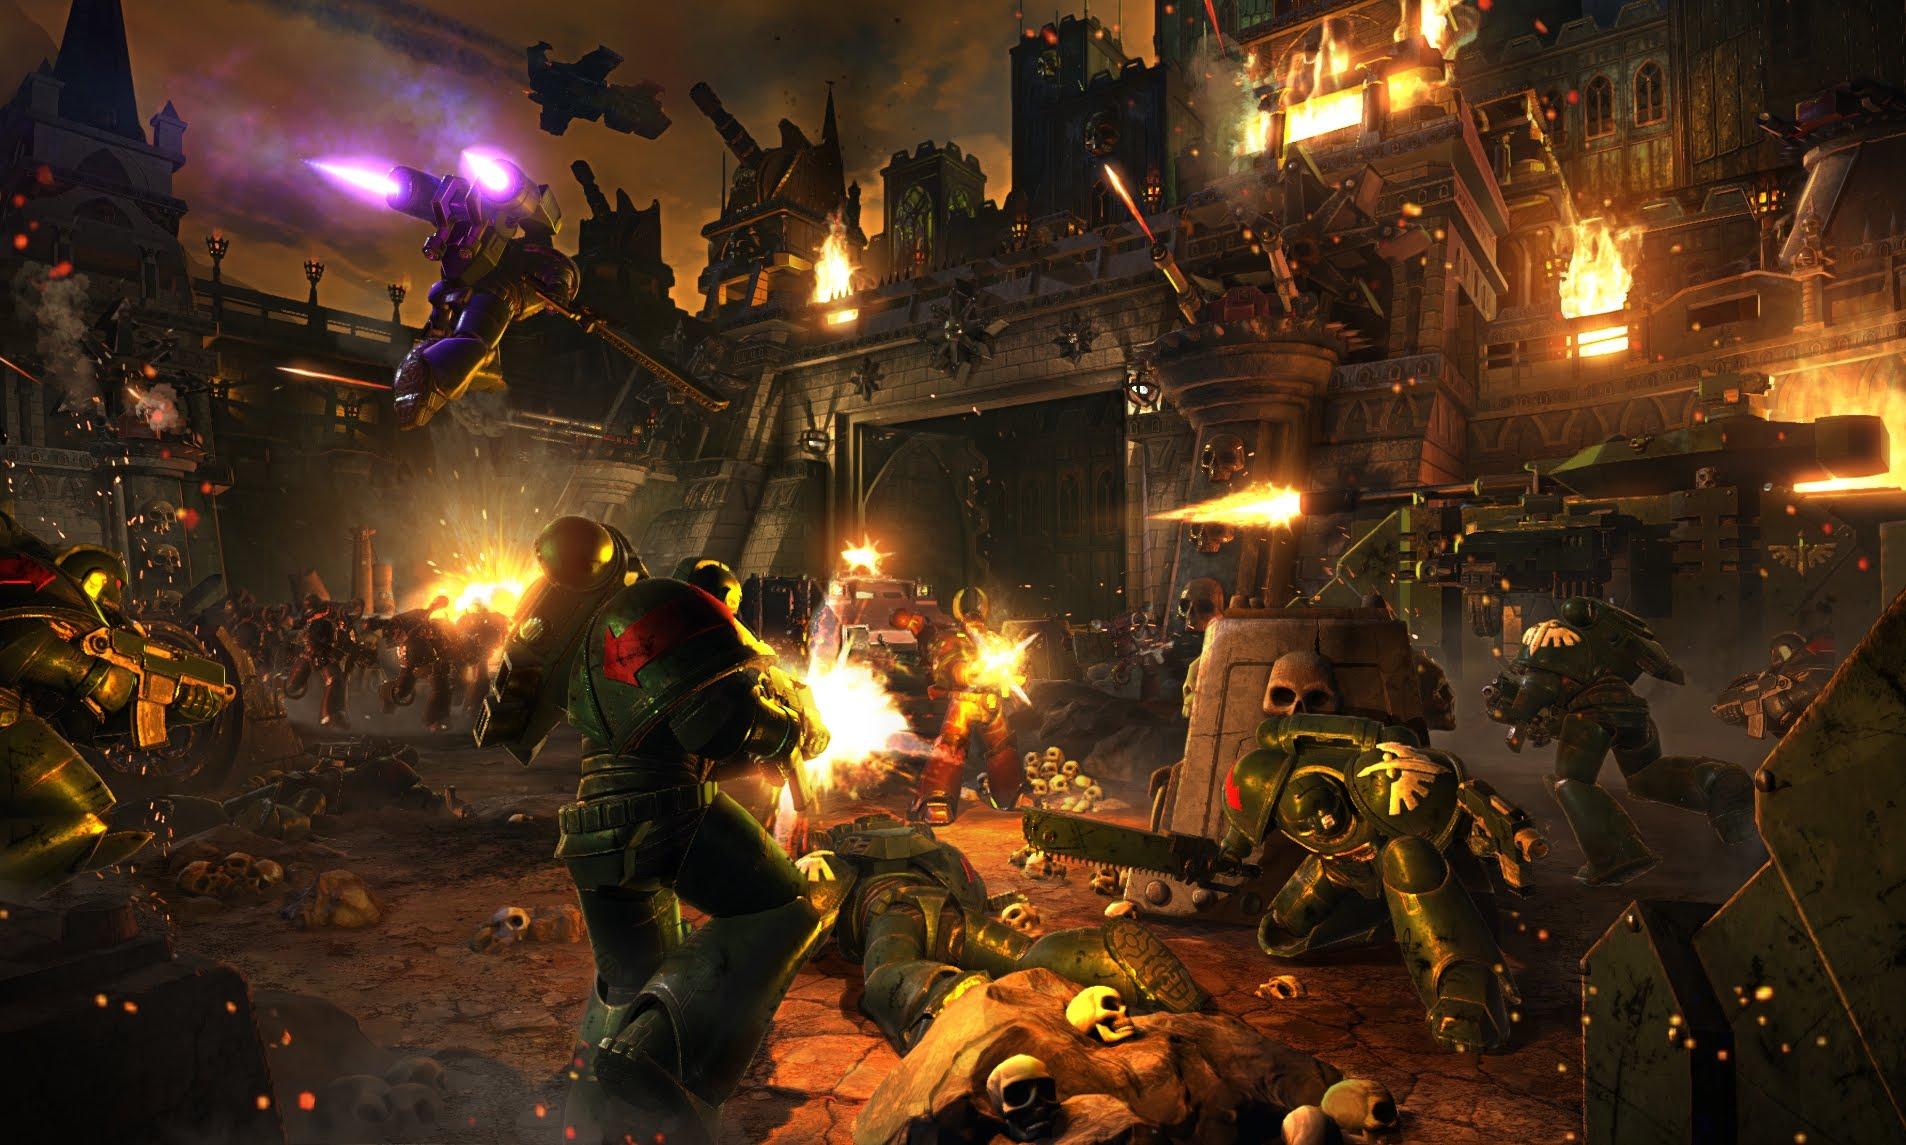 Warhammer 40,000: Eternal Crusade Wallpaper and Background Image | 1906x1145